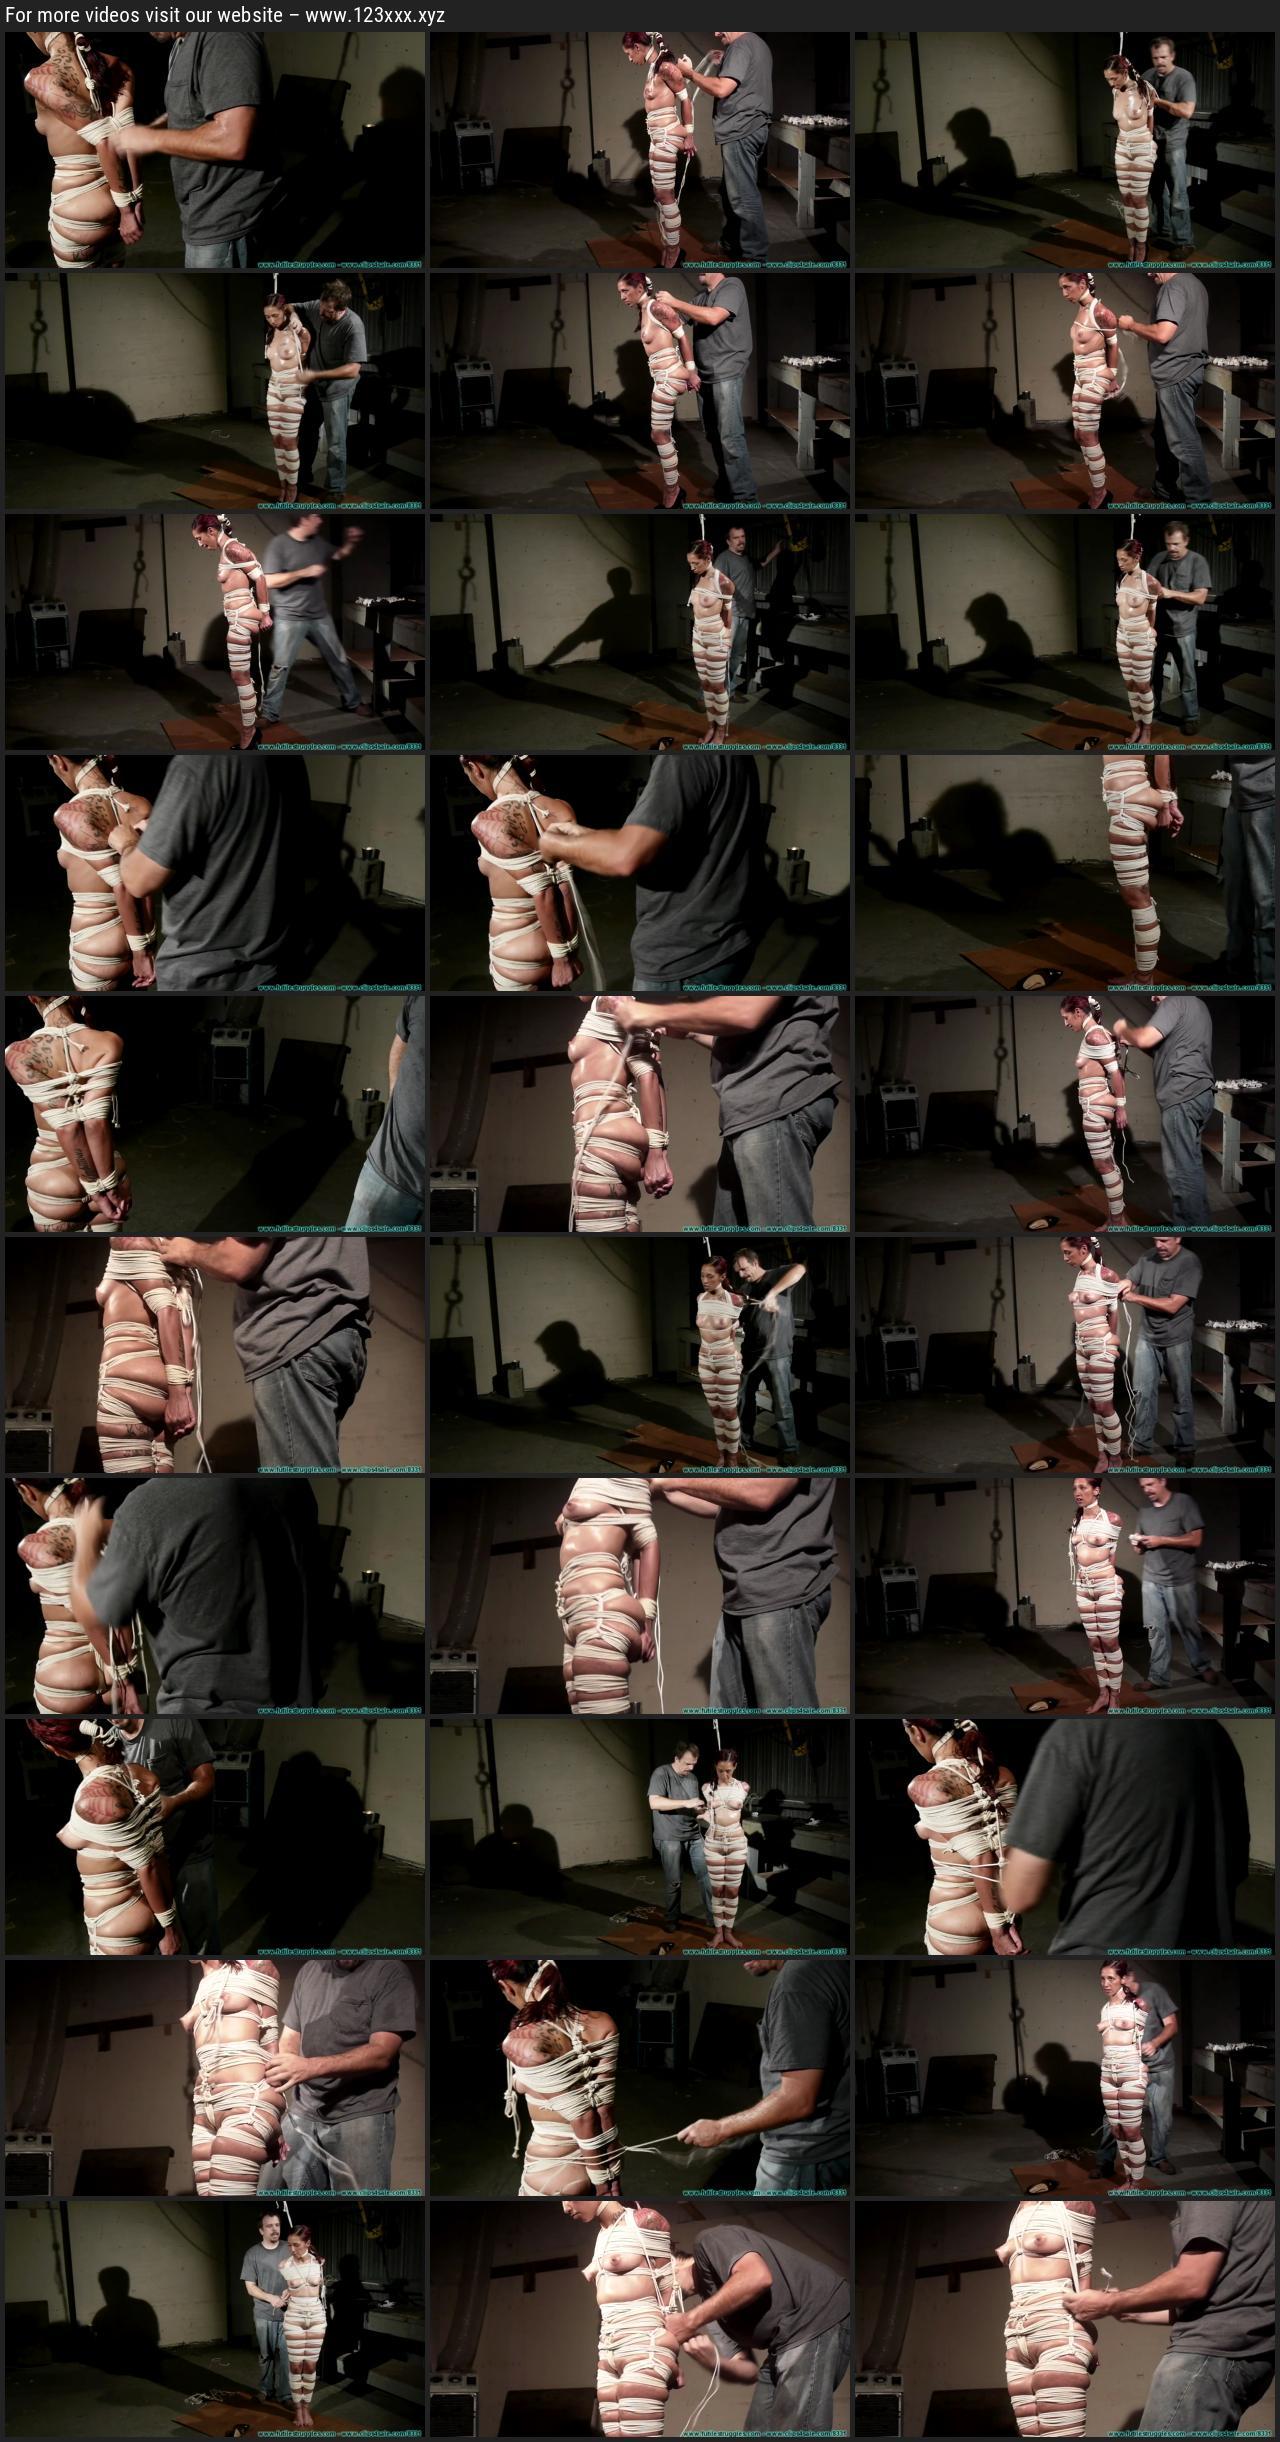 FutileStruggles.Stefania.700-Part.2.XXX.720p.MP4-hUSHhUSH_thumbs.jpg